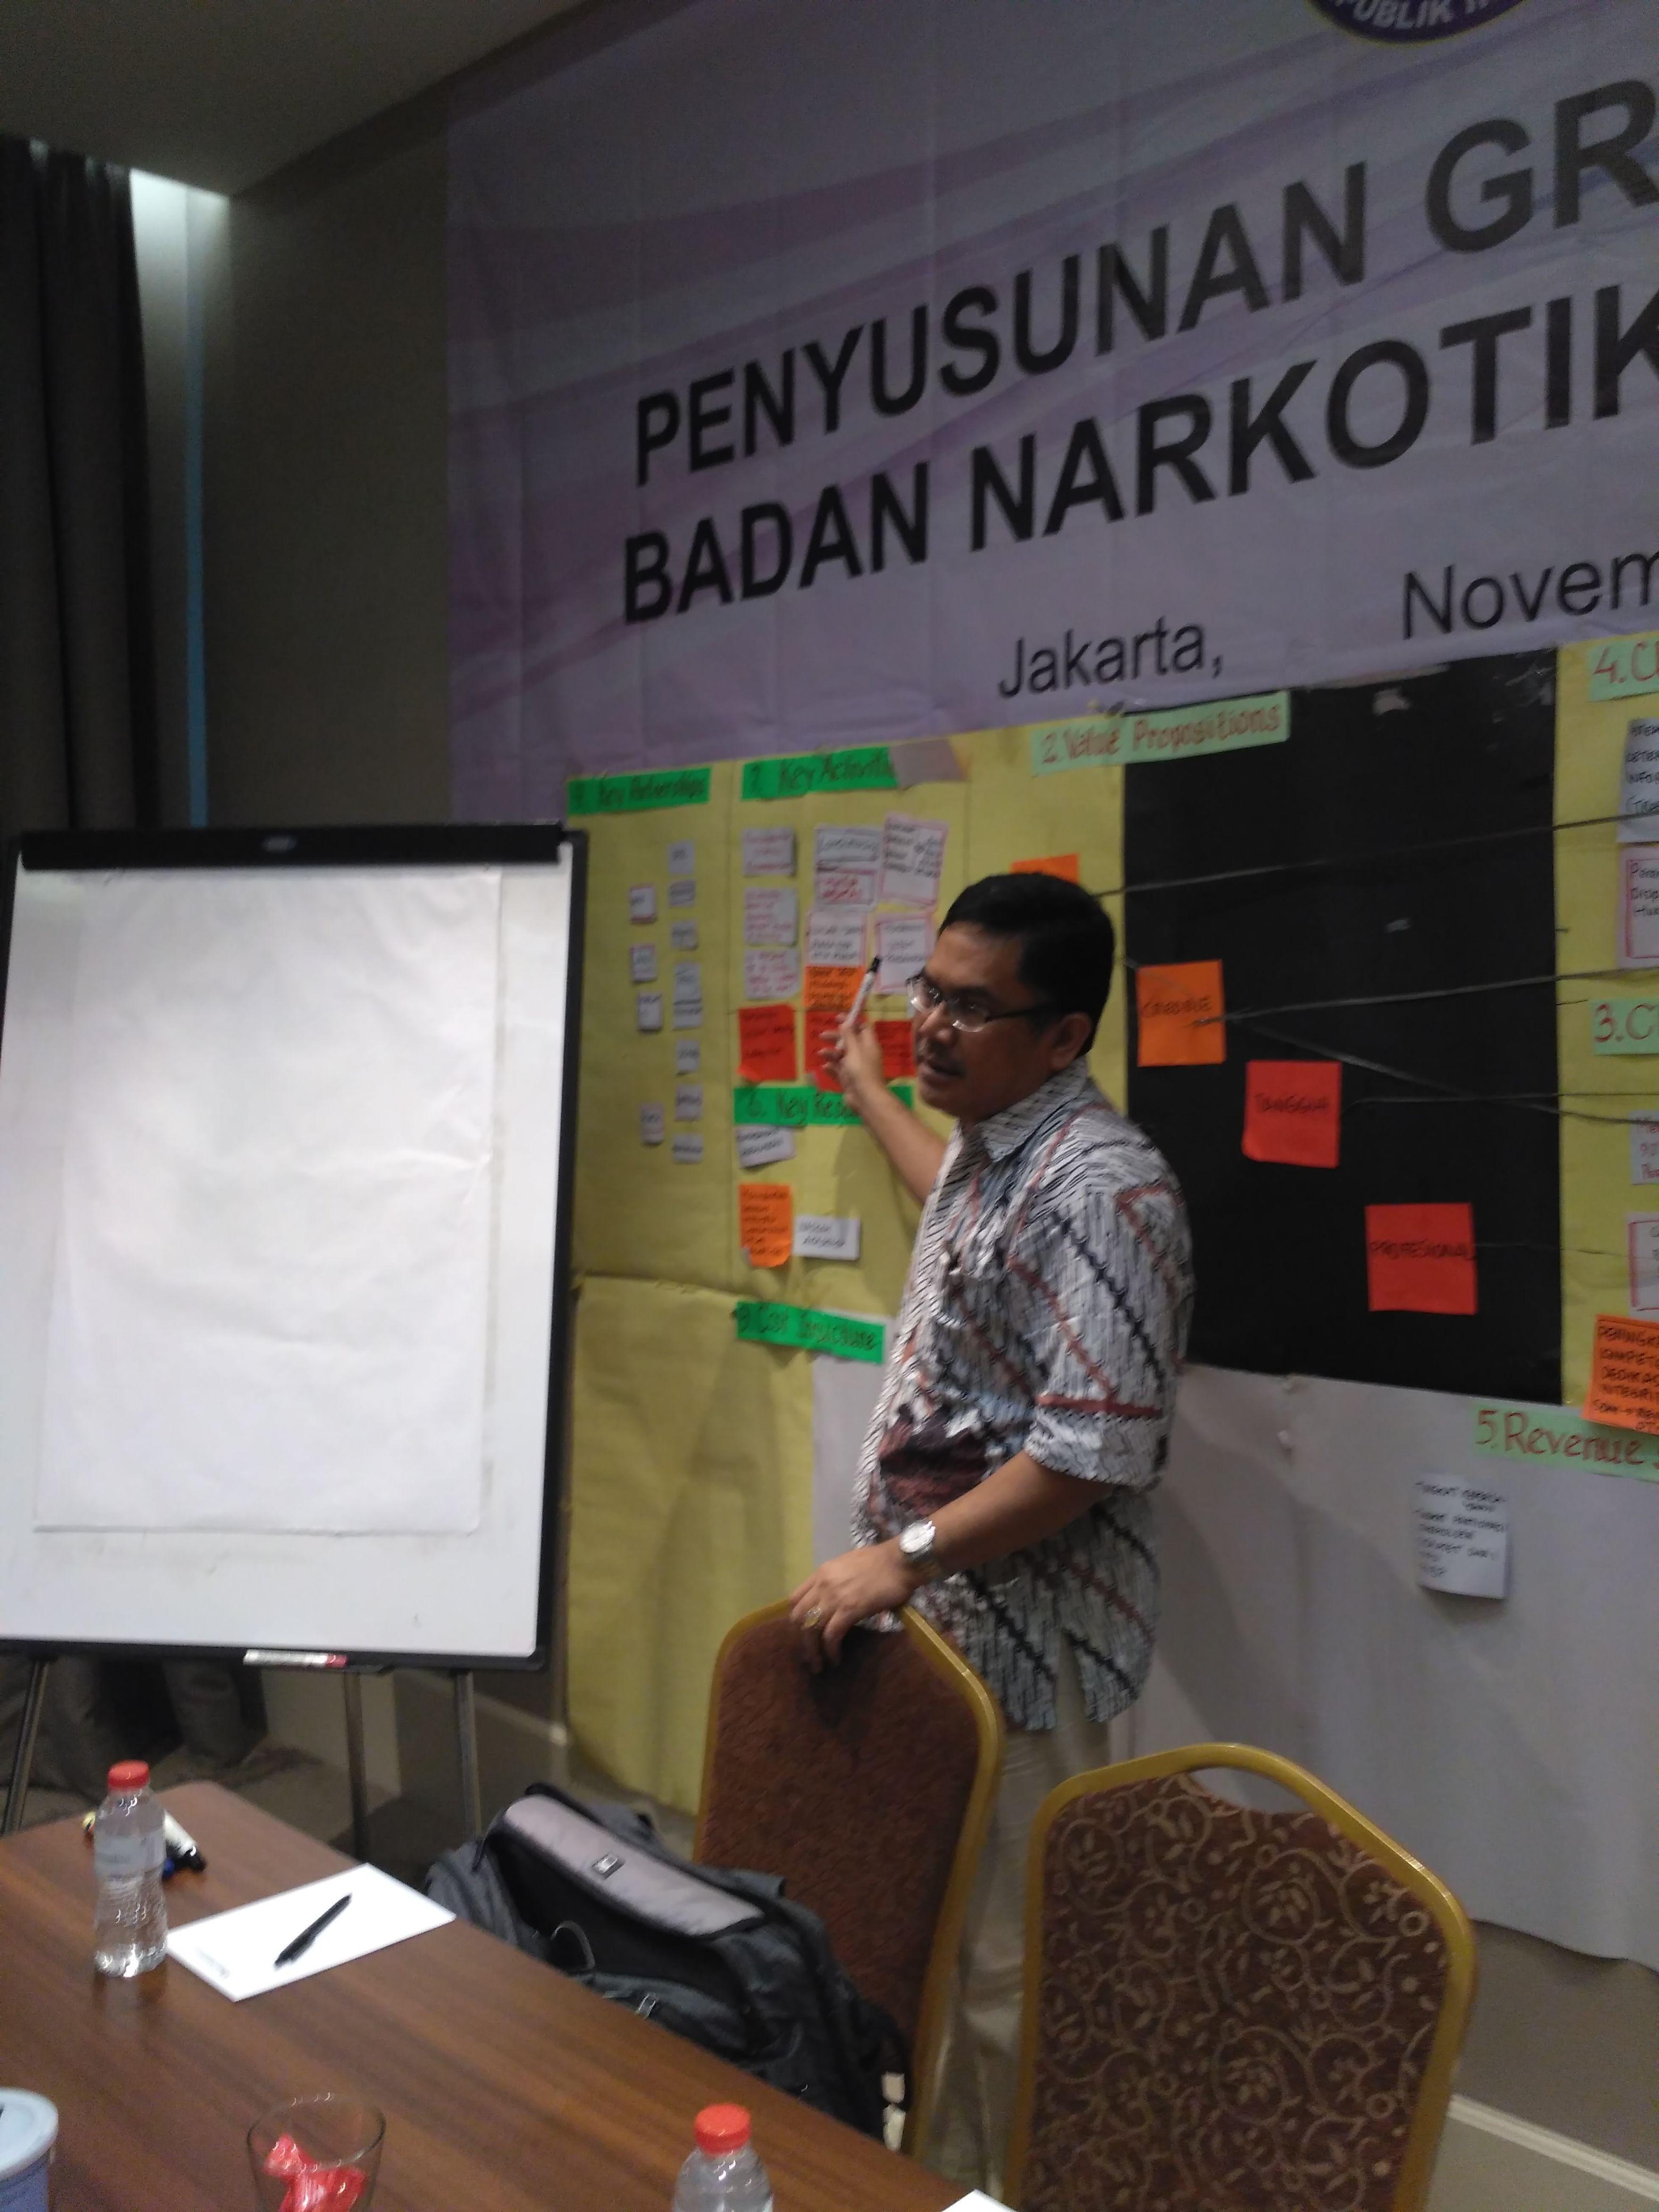 Penyusunan Grand Design BNN, Swiss BelHotel, Jakarta 15 November 2016